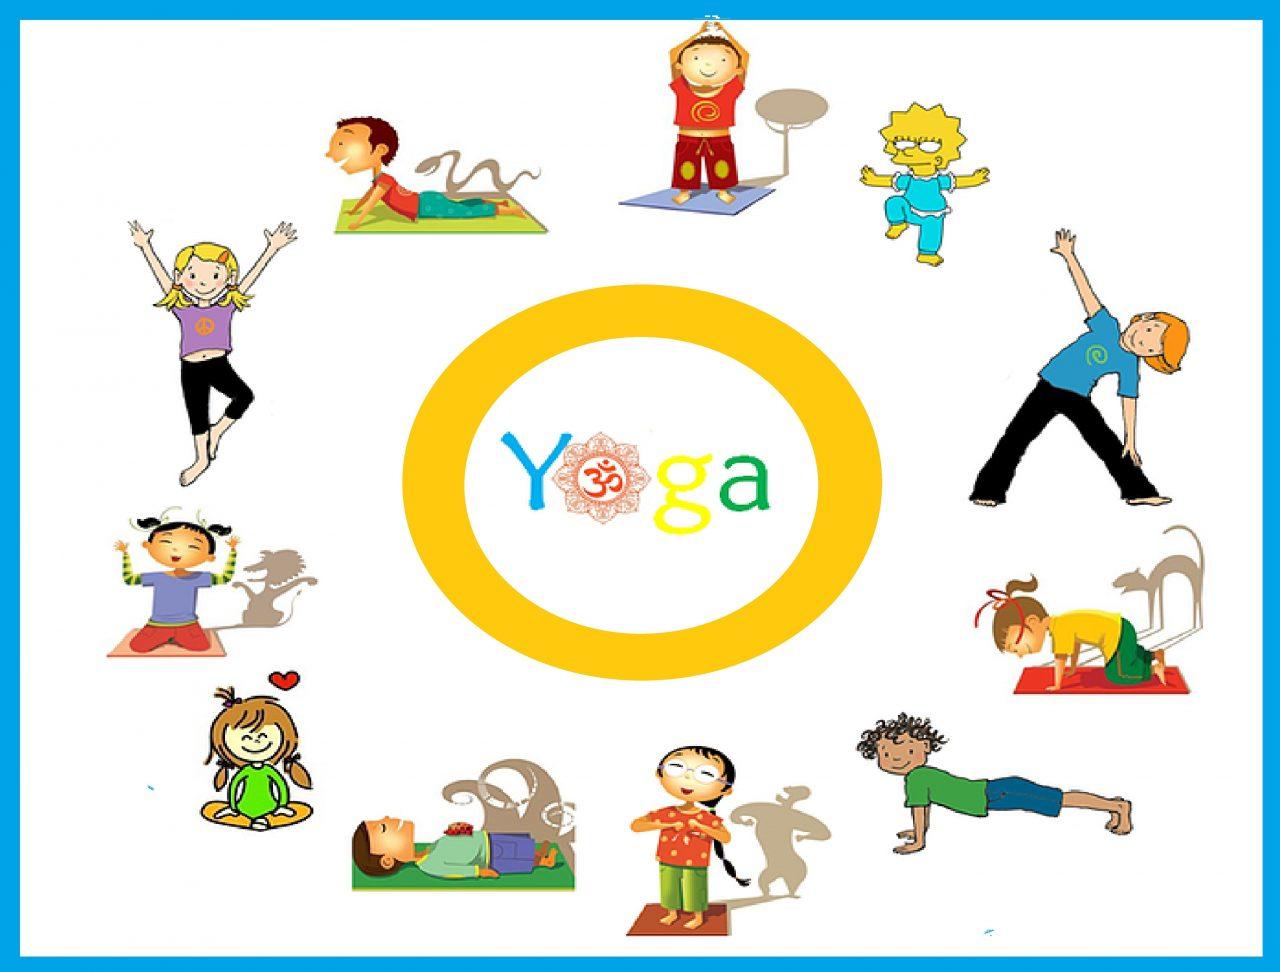 En este momento estás viendo Yoga infantil